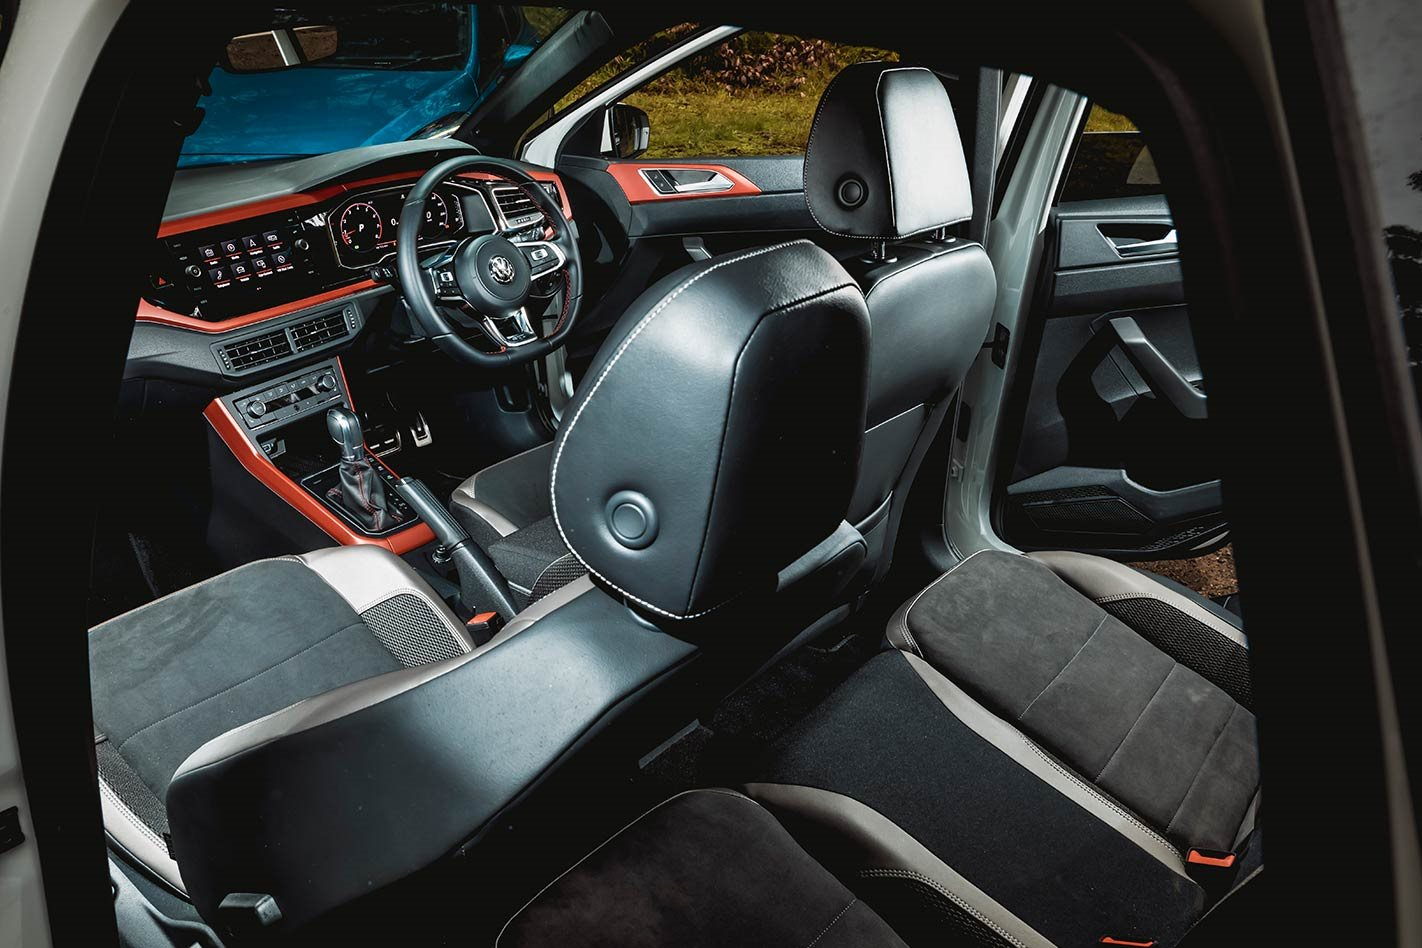 Ford Fiesta St V Volkswagen Polo Gti V Suzuki Swift Sport Hot Hatch Comparison